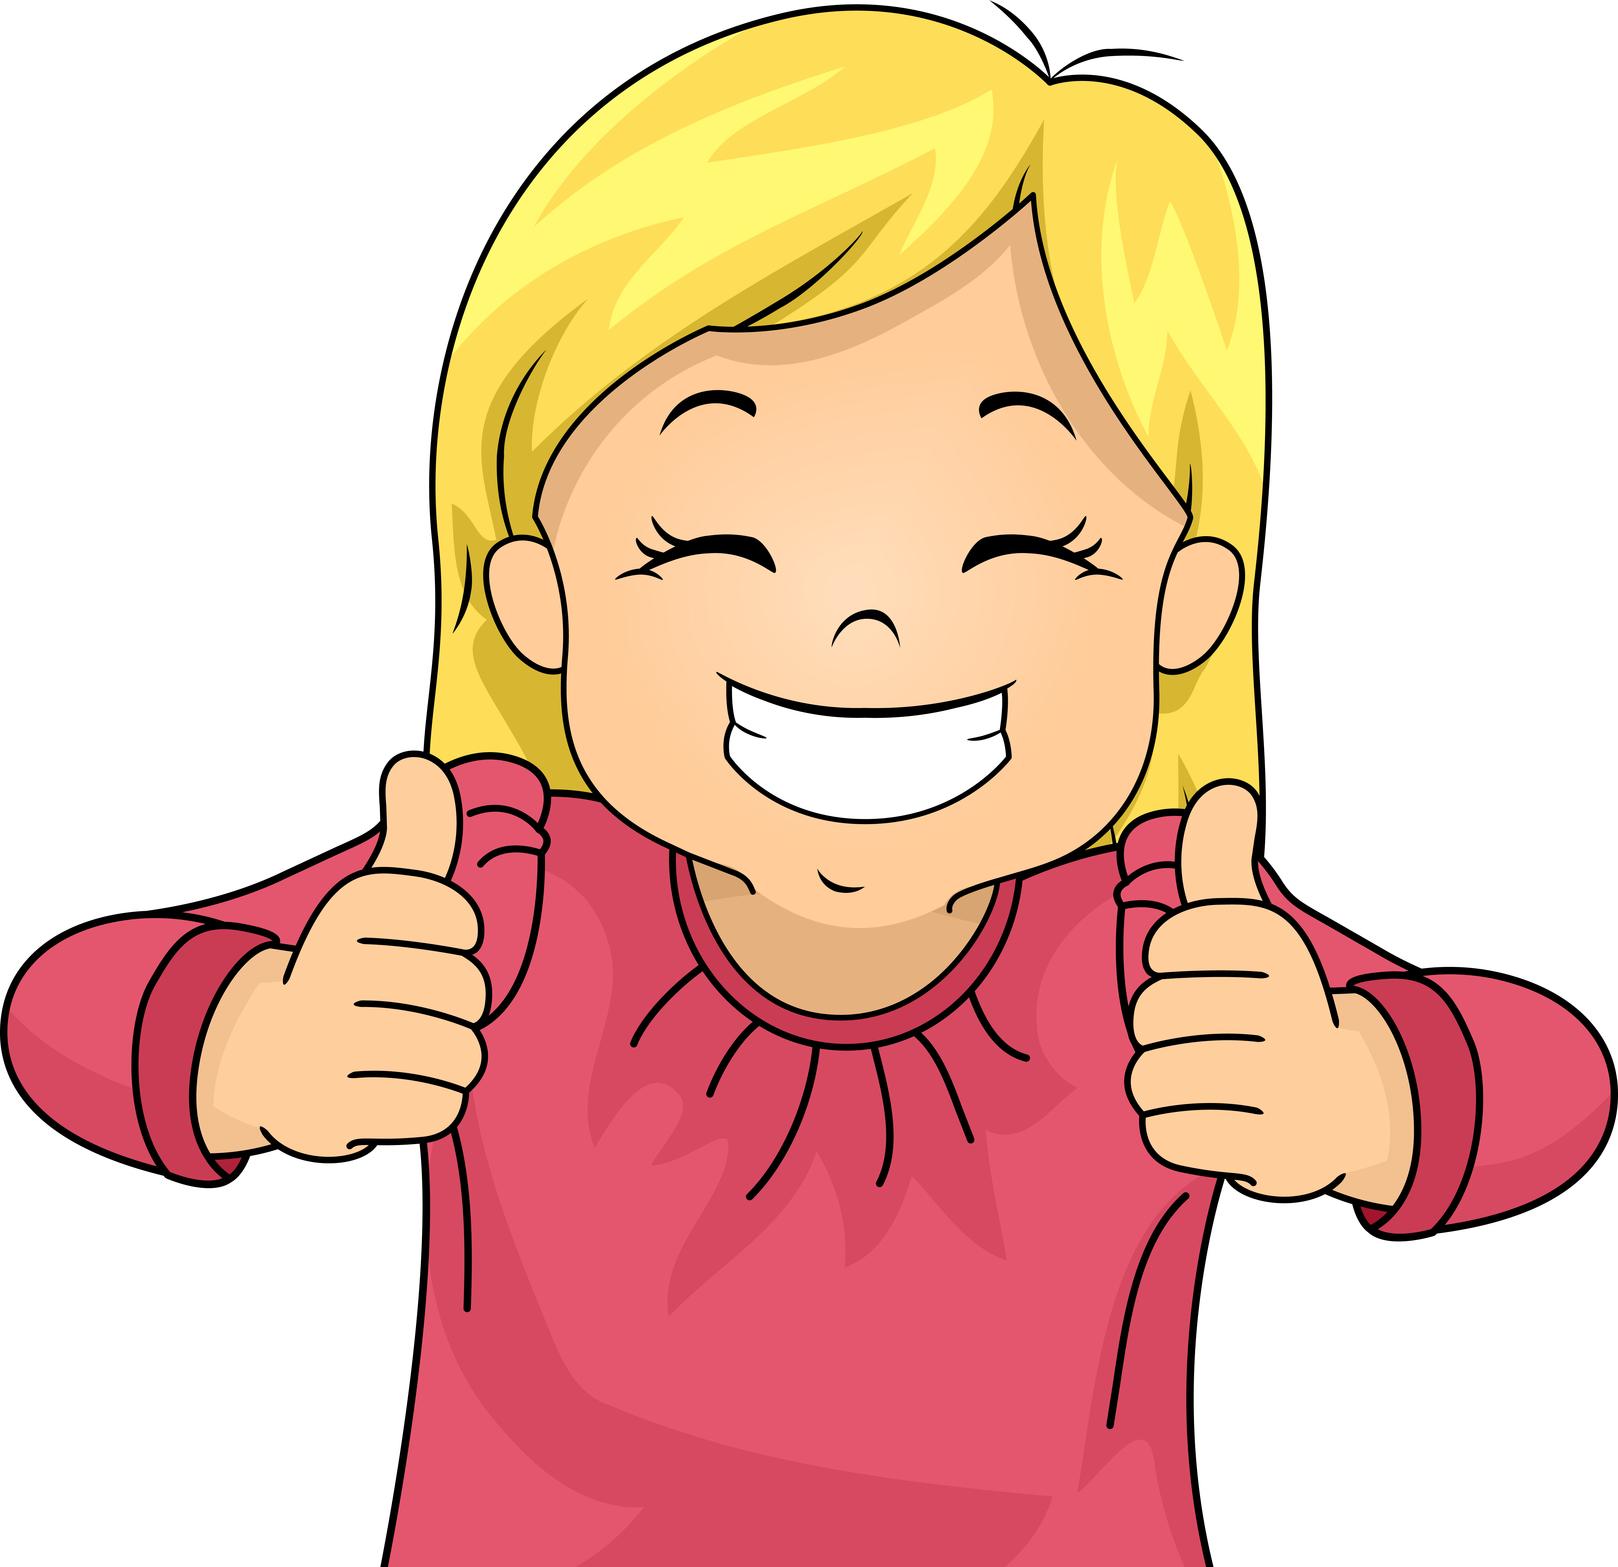 1236826_SMJPG_7TC69715M1537323M Baby girl 2 thumbs up